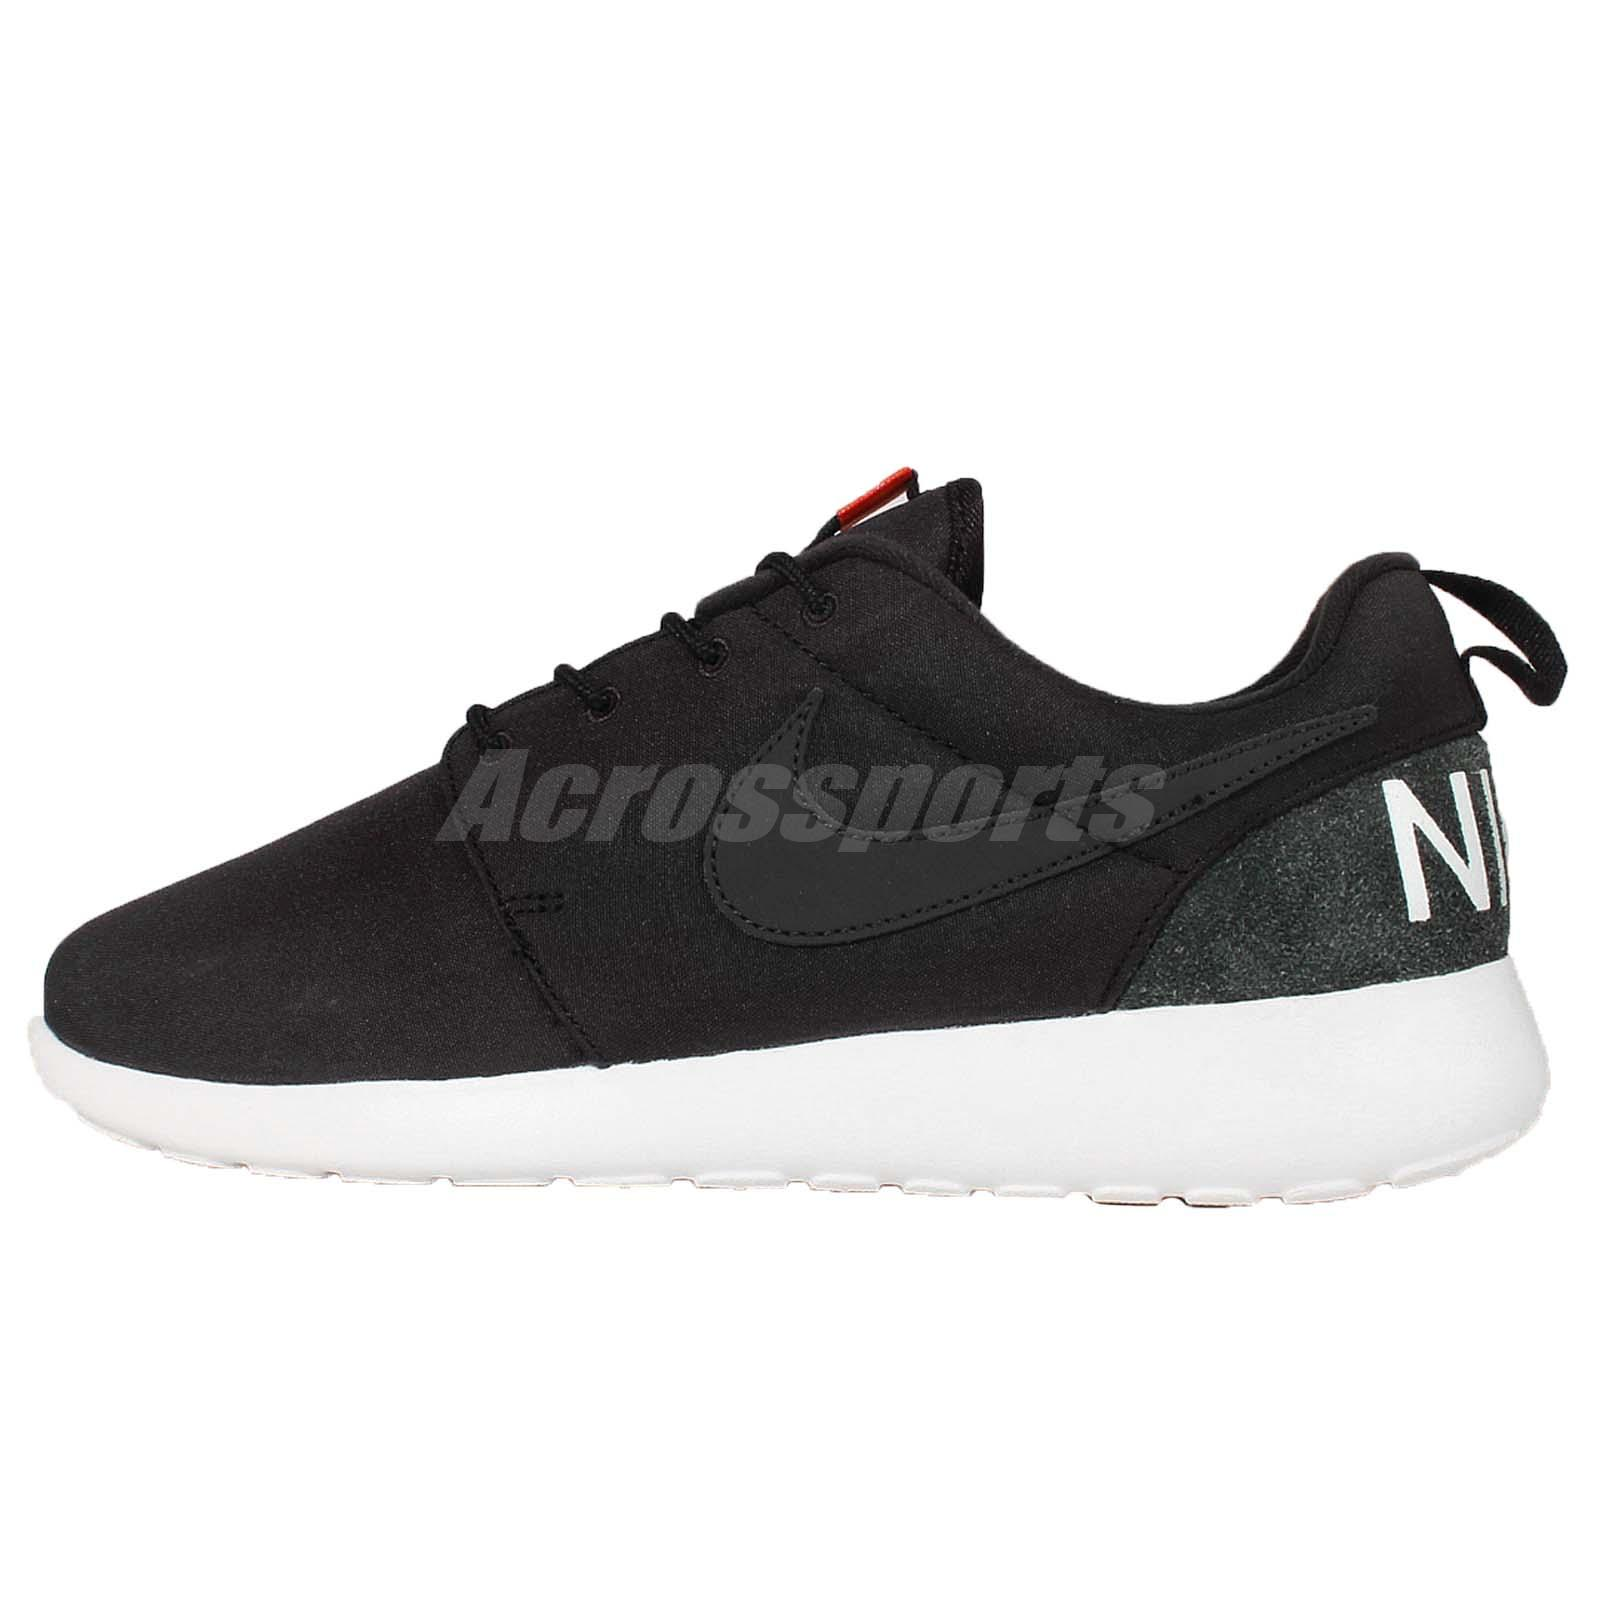 Nike Roshe Run Retro